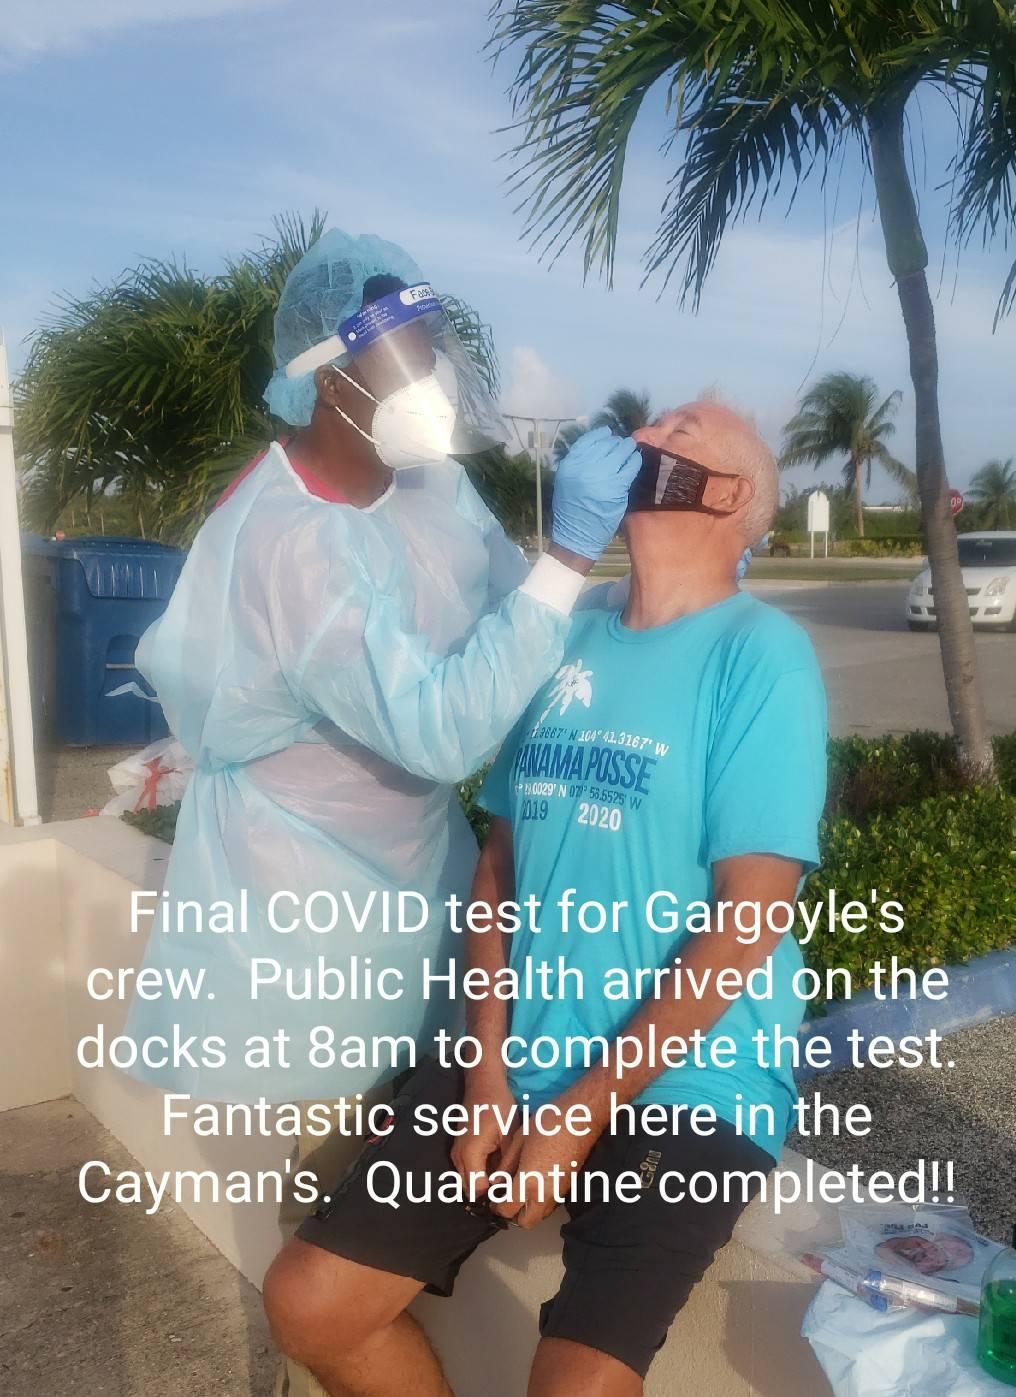 Gargoyles final COVID test in the Cayman Islands